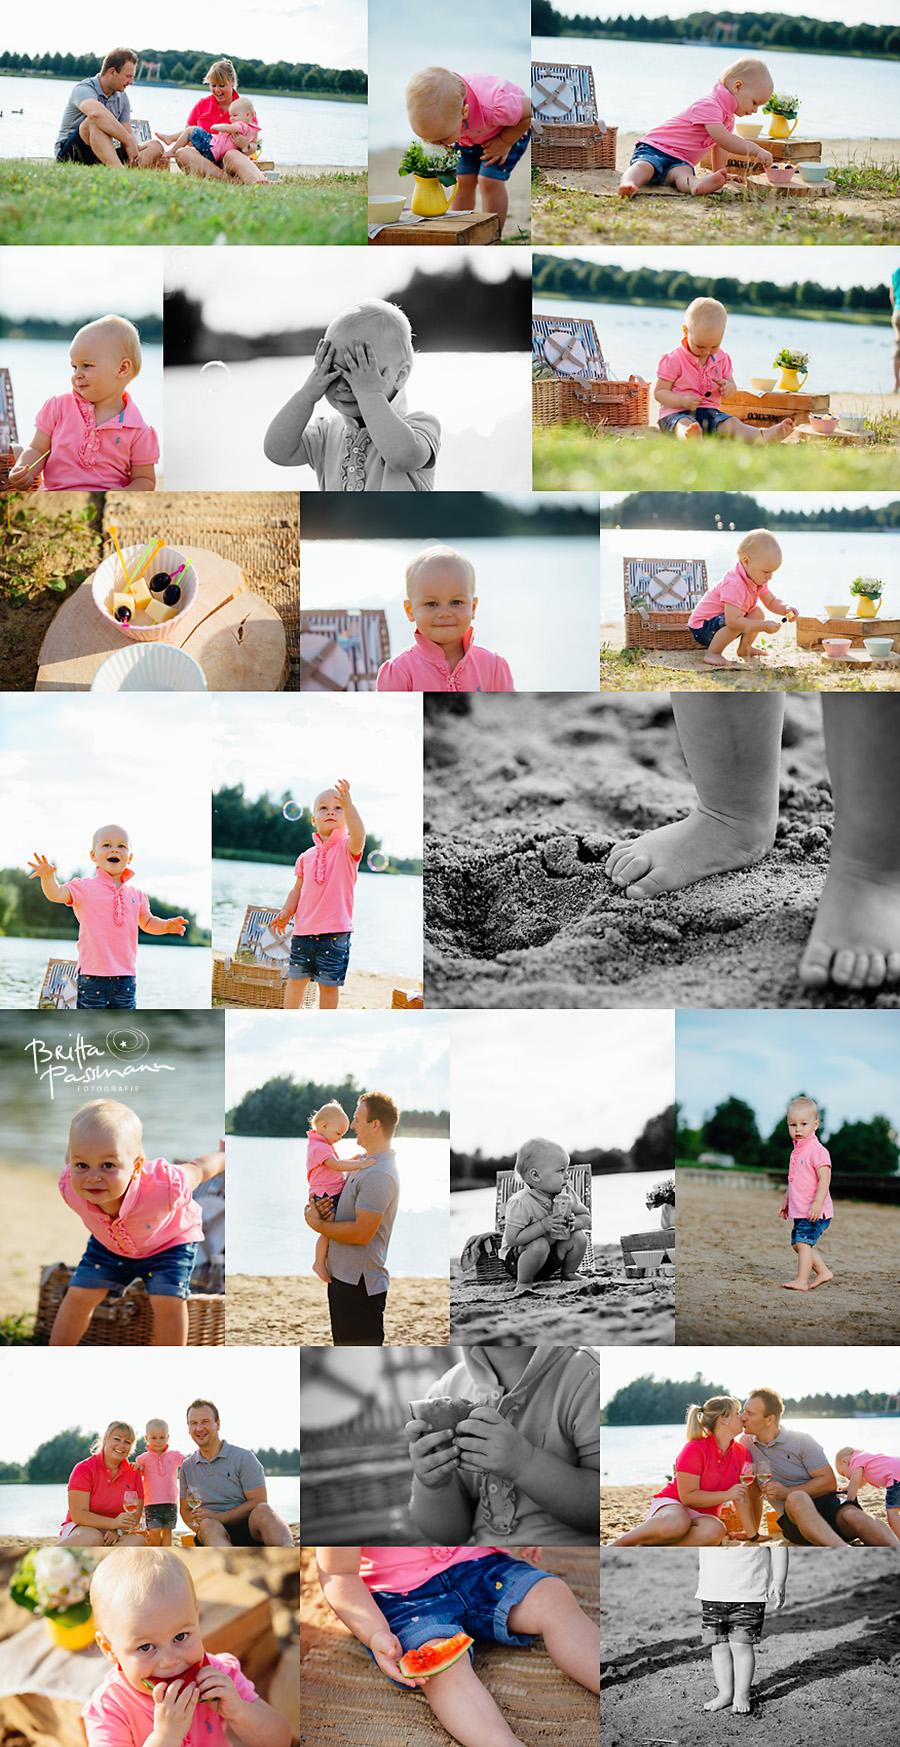 Familienpicknick_Fotoshooting_Familienfotos_Kinderfotos_Dortmund_Schwerte_26